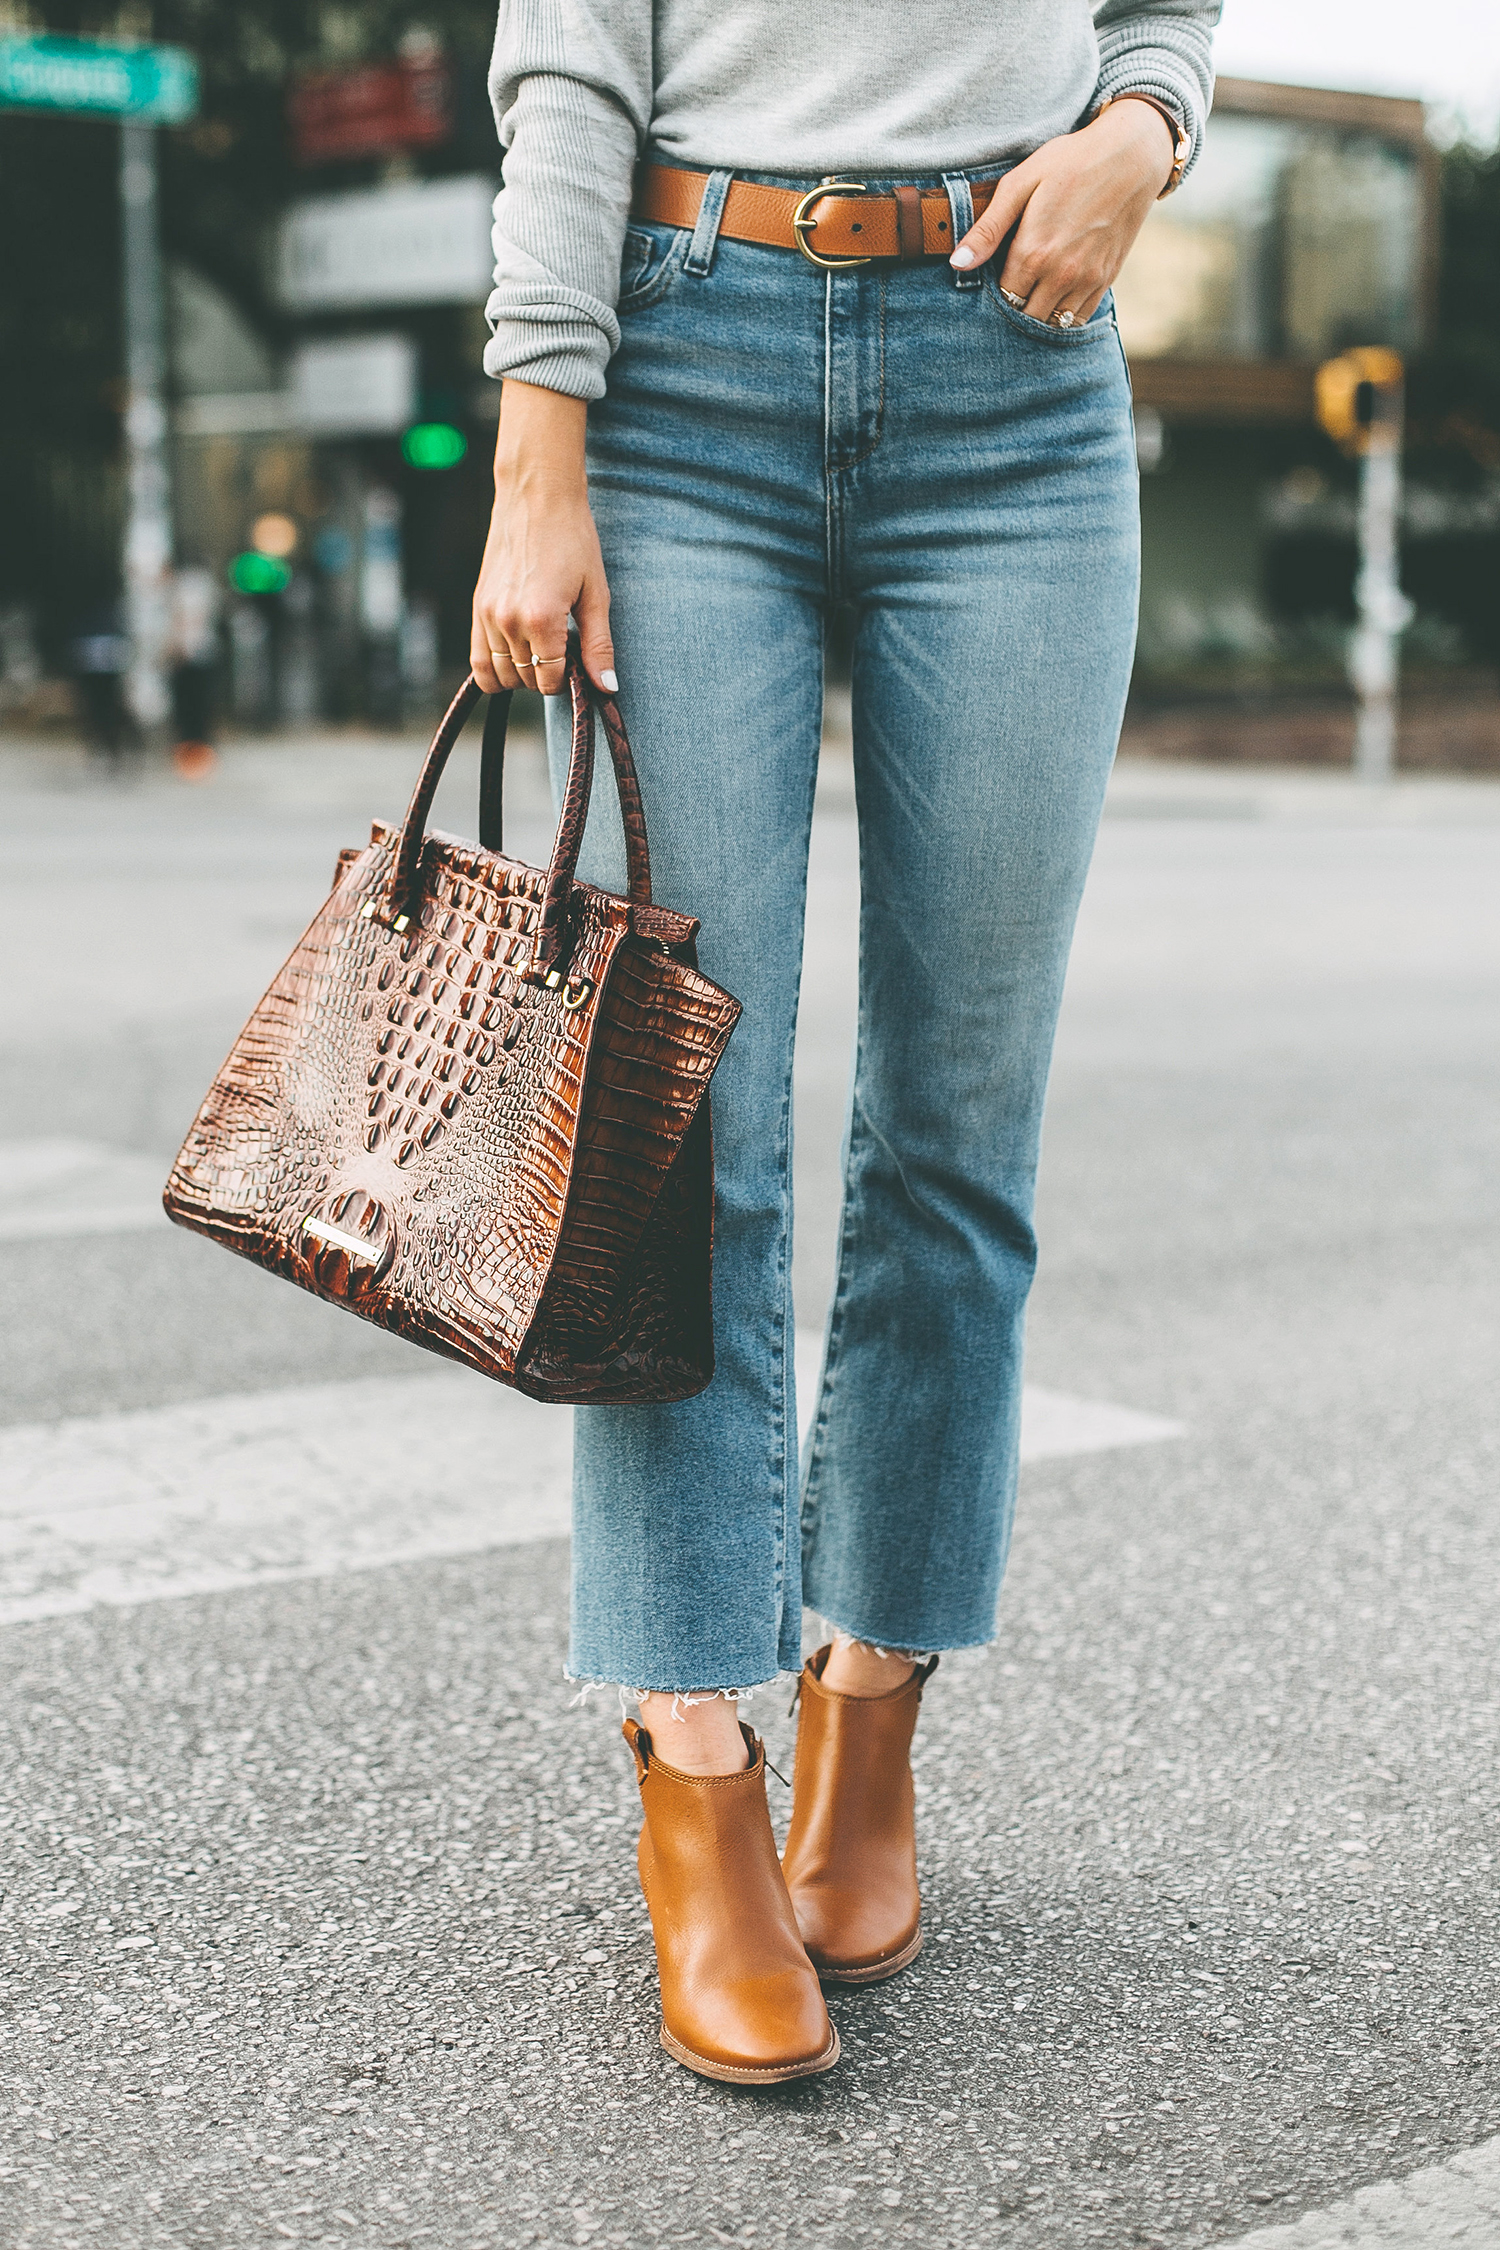 livvyland-blog-olivia-watson-south-congress-avenue-austin-texas-fashion-life-style-blogger-bdg-high-waist-crop-flare-jeans-4